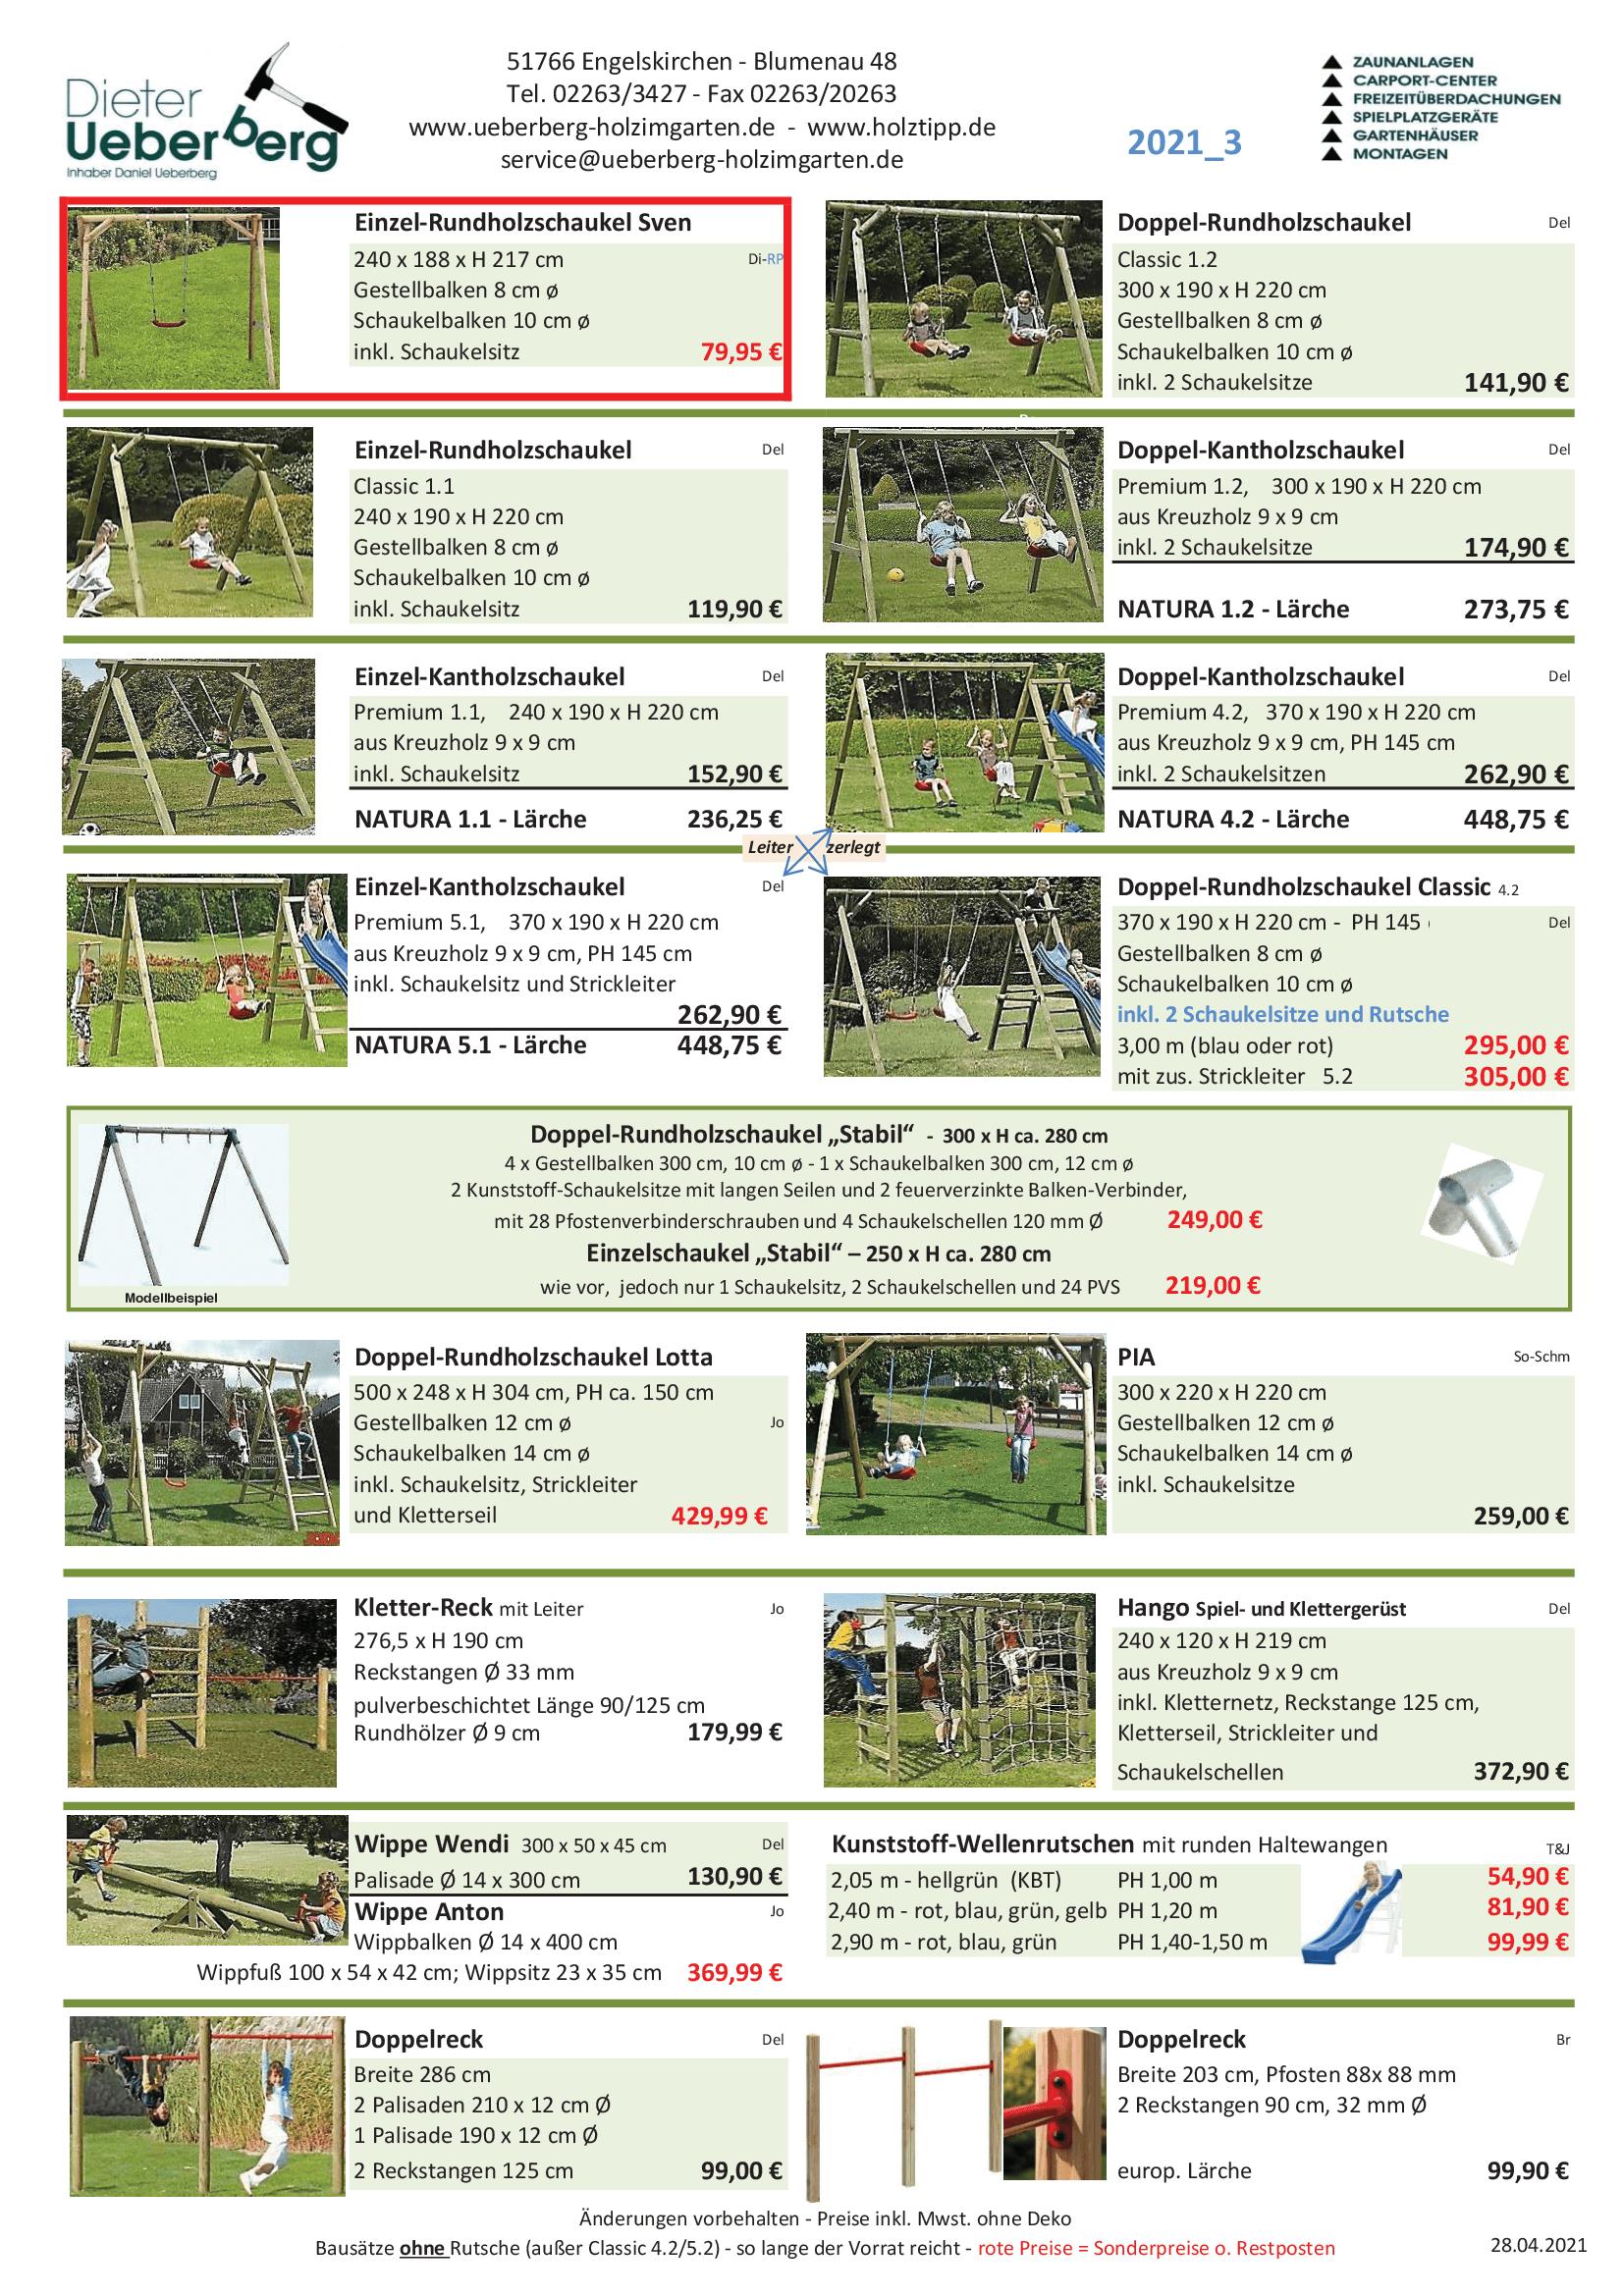 Angebote Spielgeräte Ueberberg 2021_3